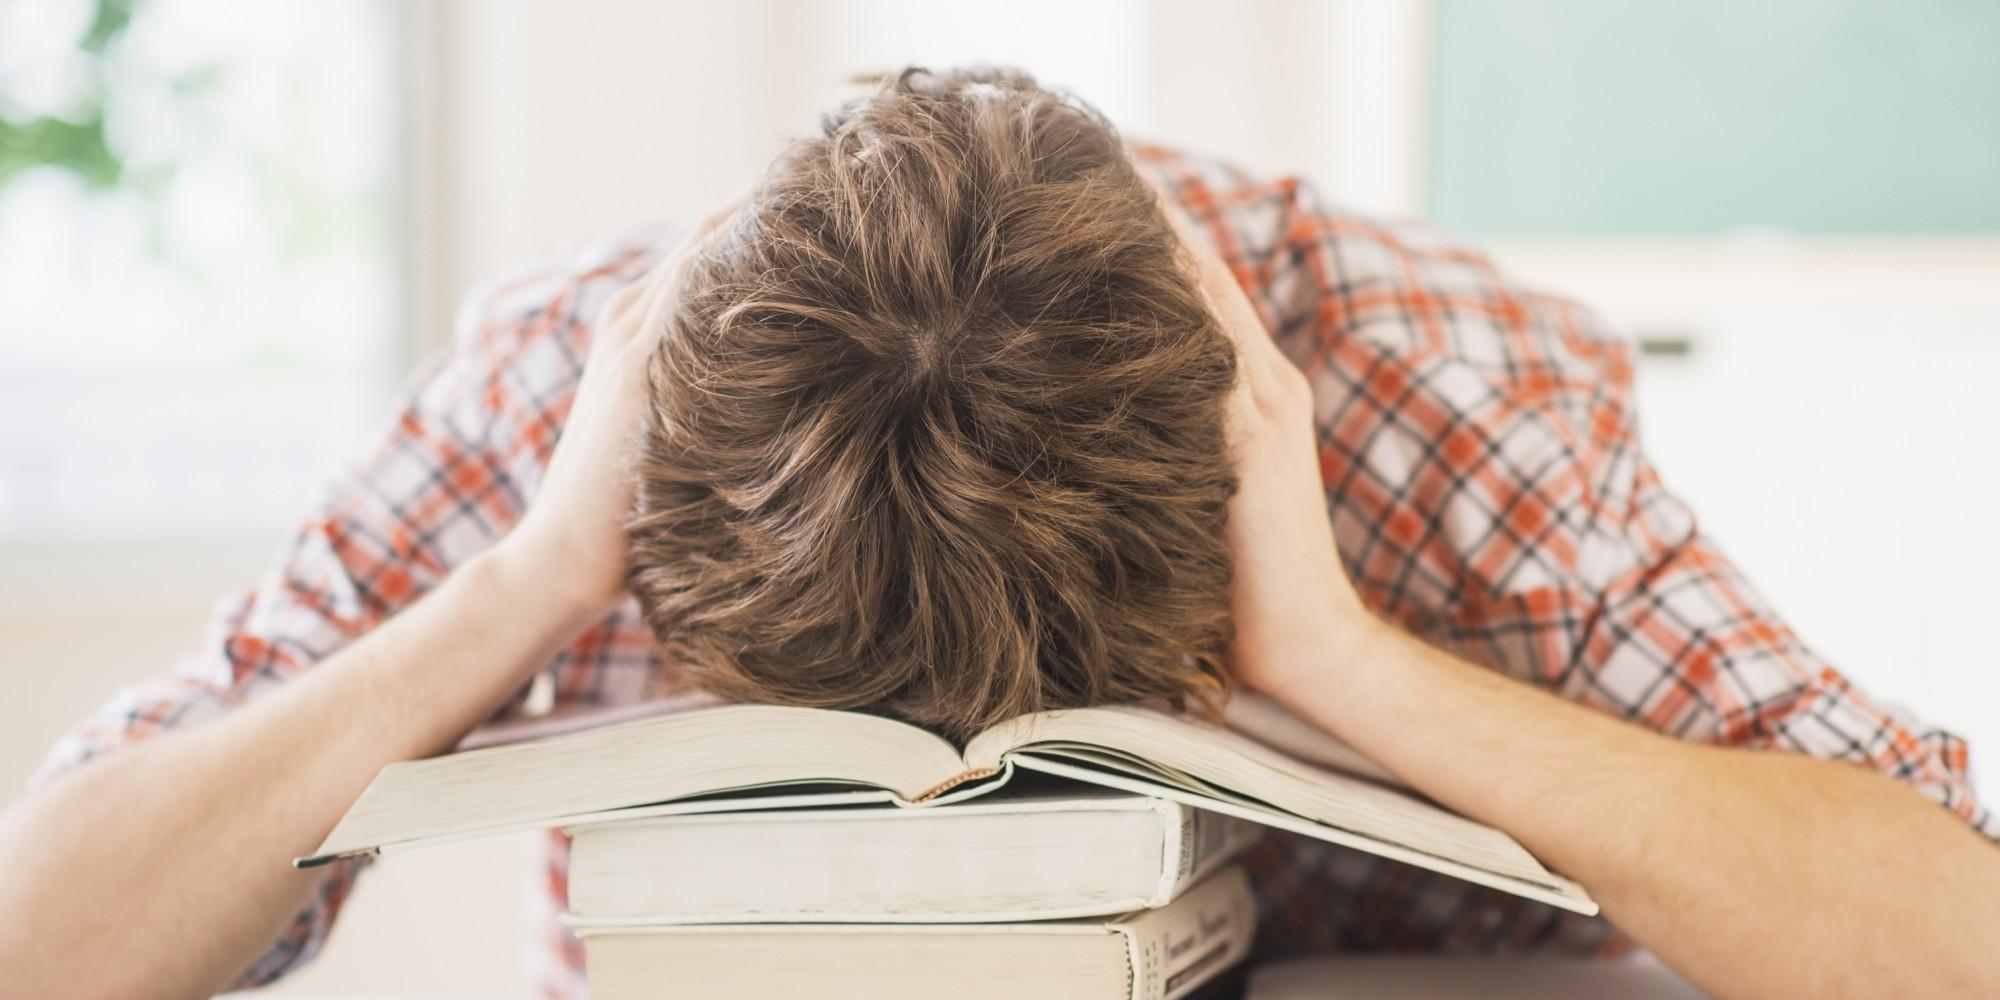 Success in School - Identifying Roadblocks to Great Grades